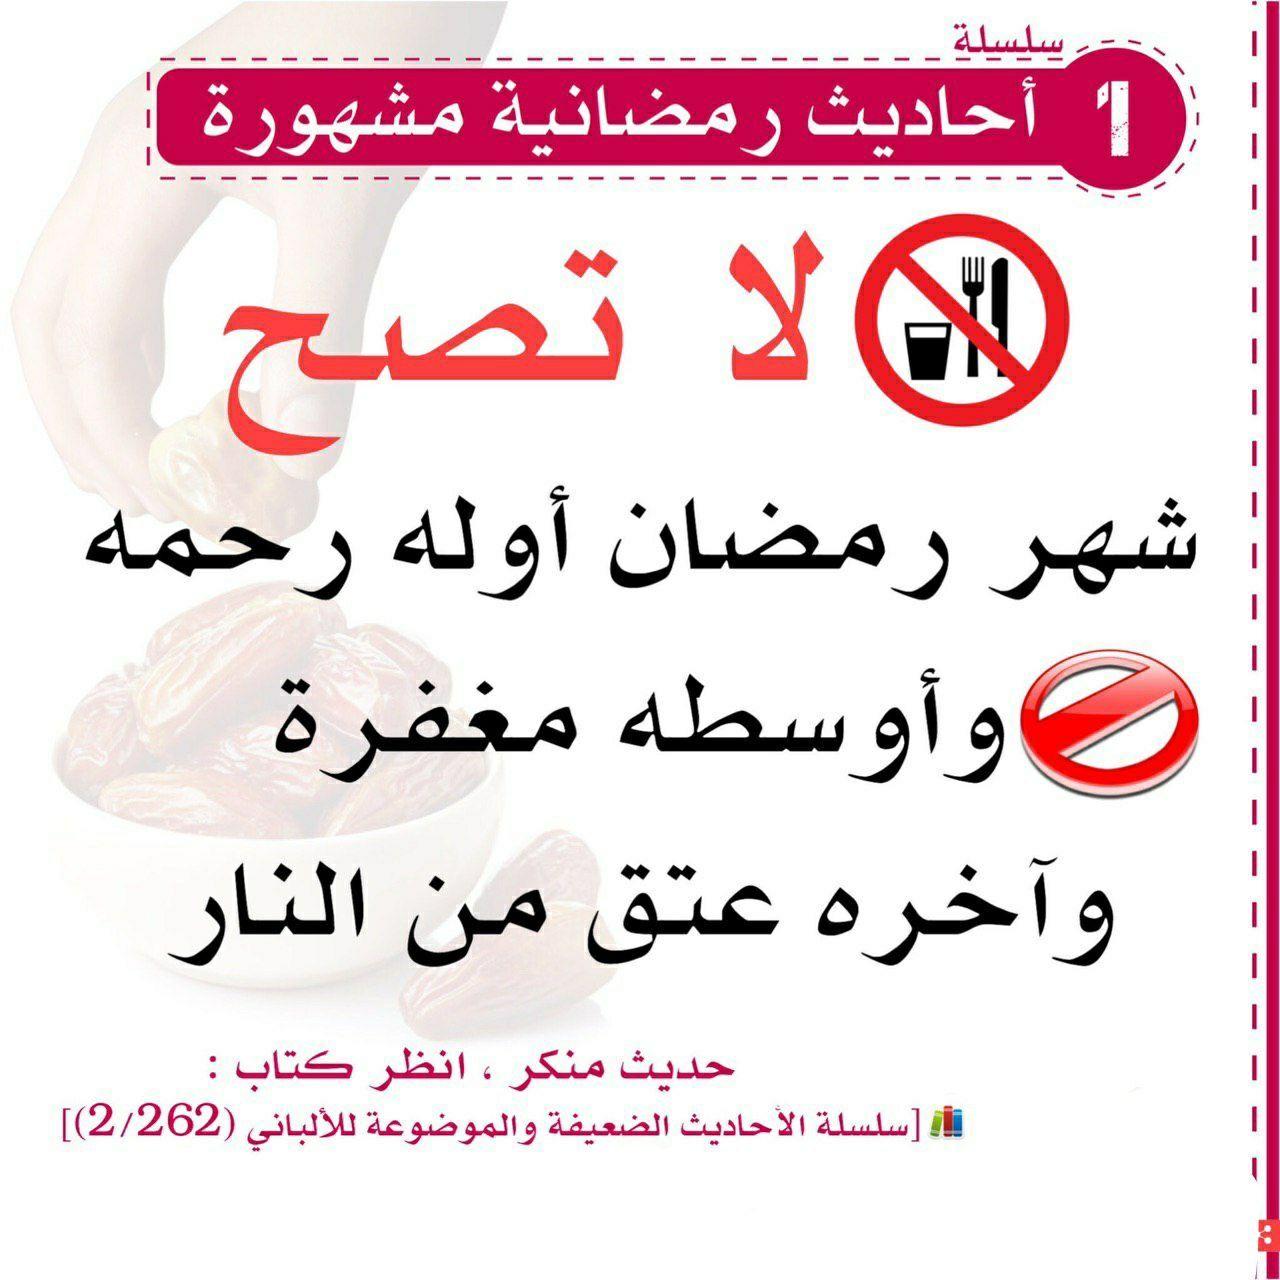 Pin By الأثر الجميل On سلسة احاديث منتشرة لا تصح Words Quotes Inspirational Quotes Arabic Phrases